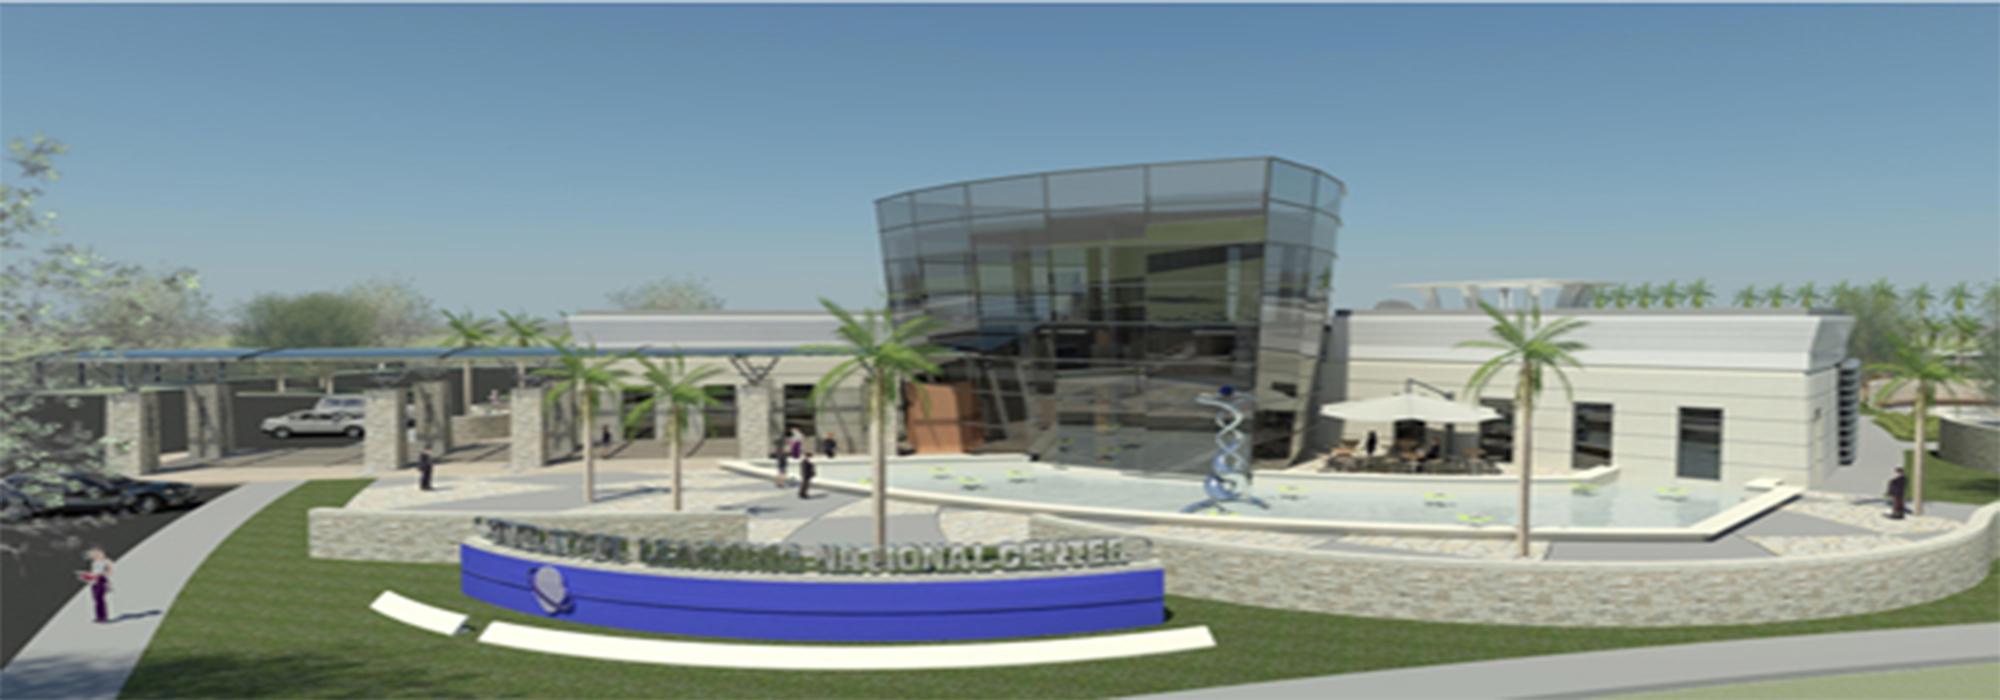 Lake Nona Medical City VA SimLearn Facility